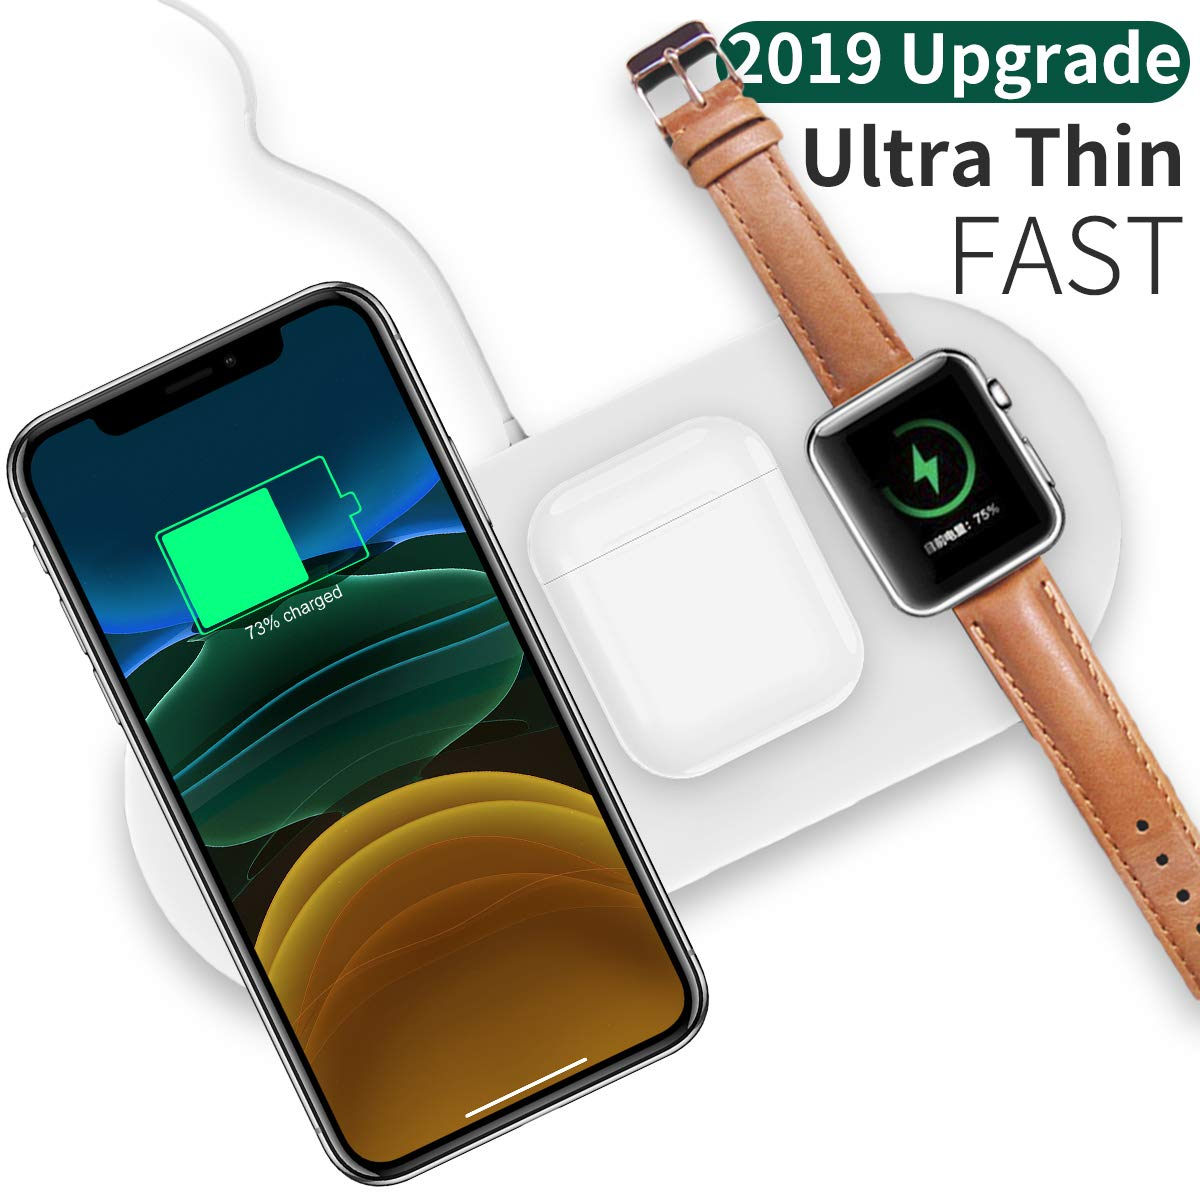 iWatch Sereis 4//3//2 and Airpods 2 QI habilitado Tel/éfono AICase Cargador inal/ámbrico r/ápido de 10 W 3 en 1 Qi Cargador Inducci/ón Compatible con iPhone 11 XS Max//XS//8//8Plus